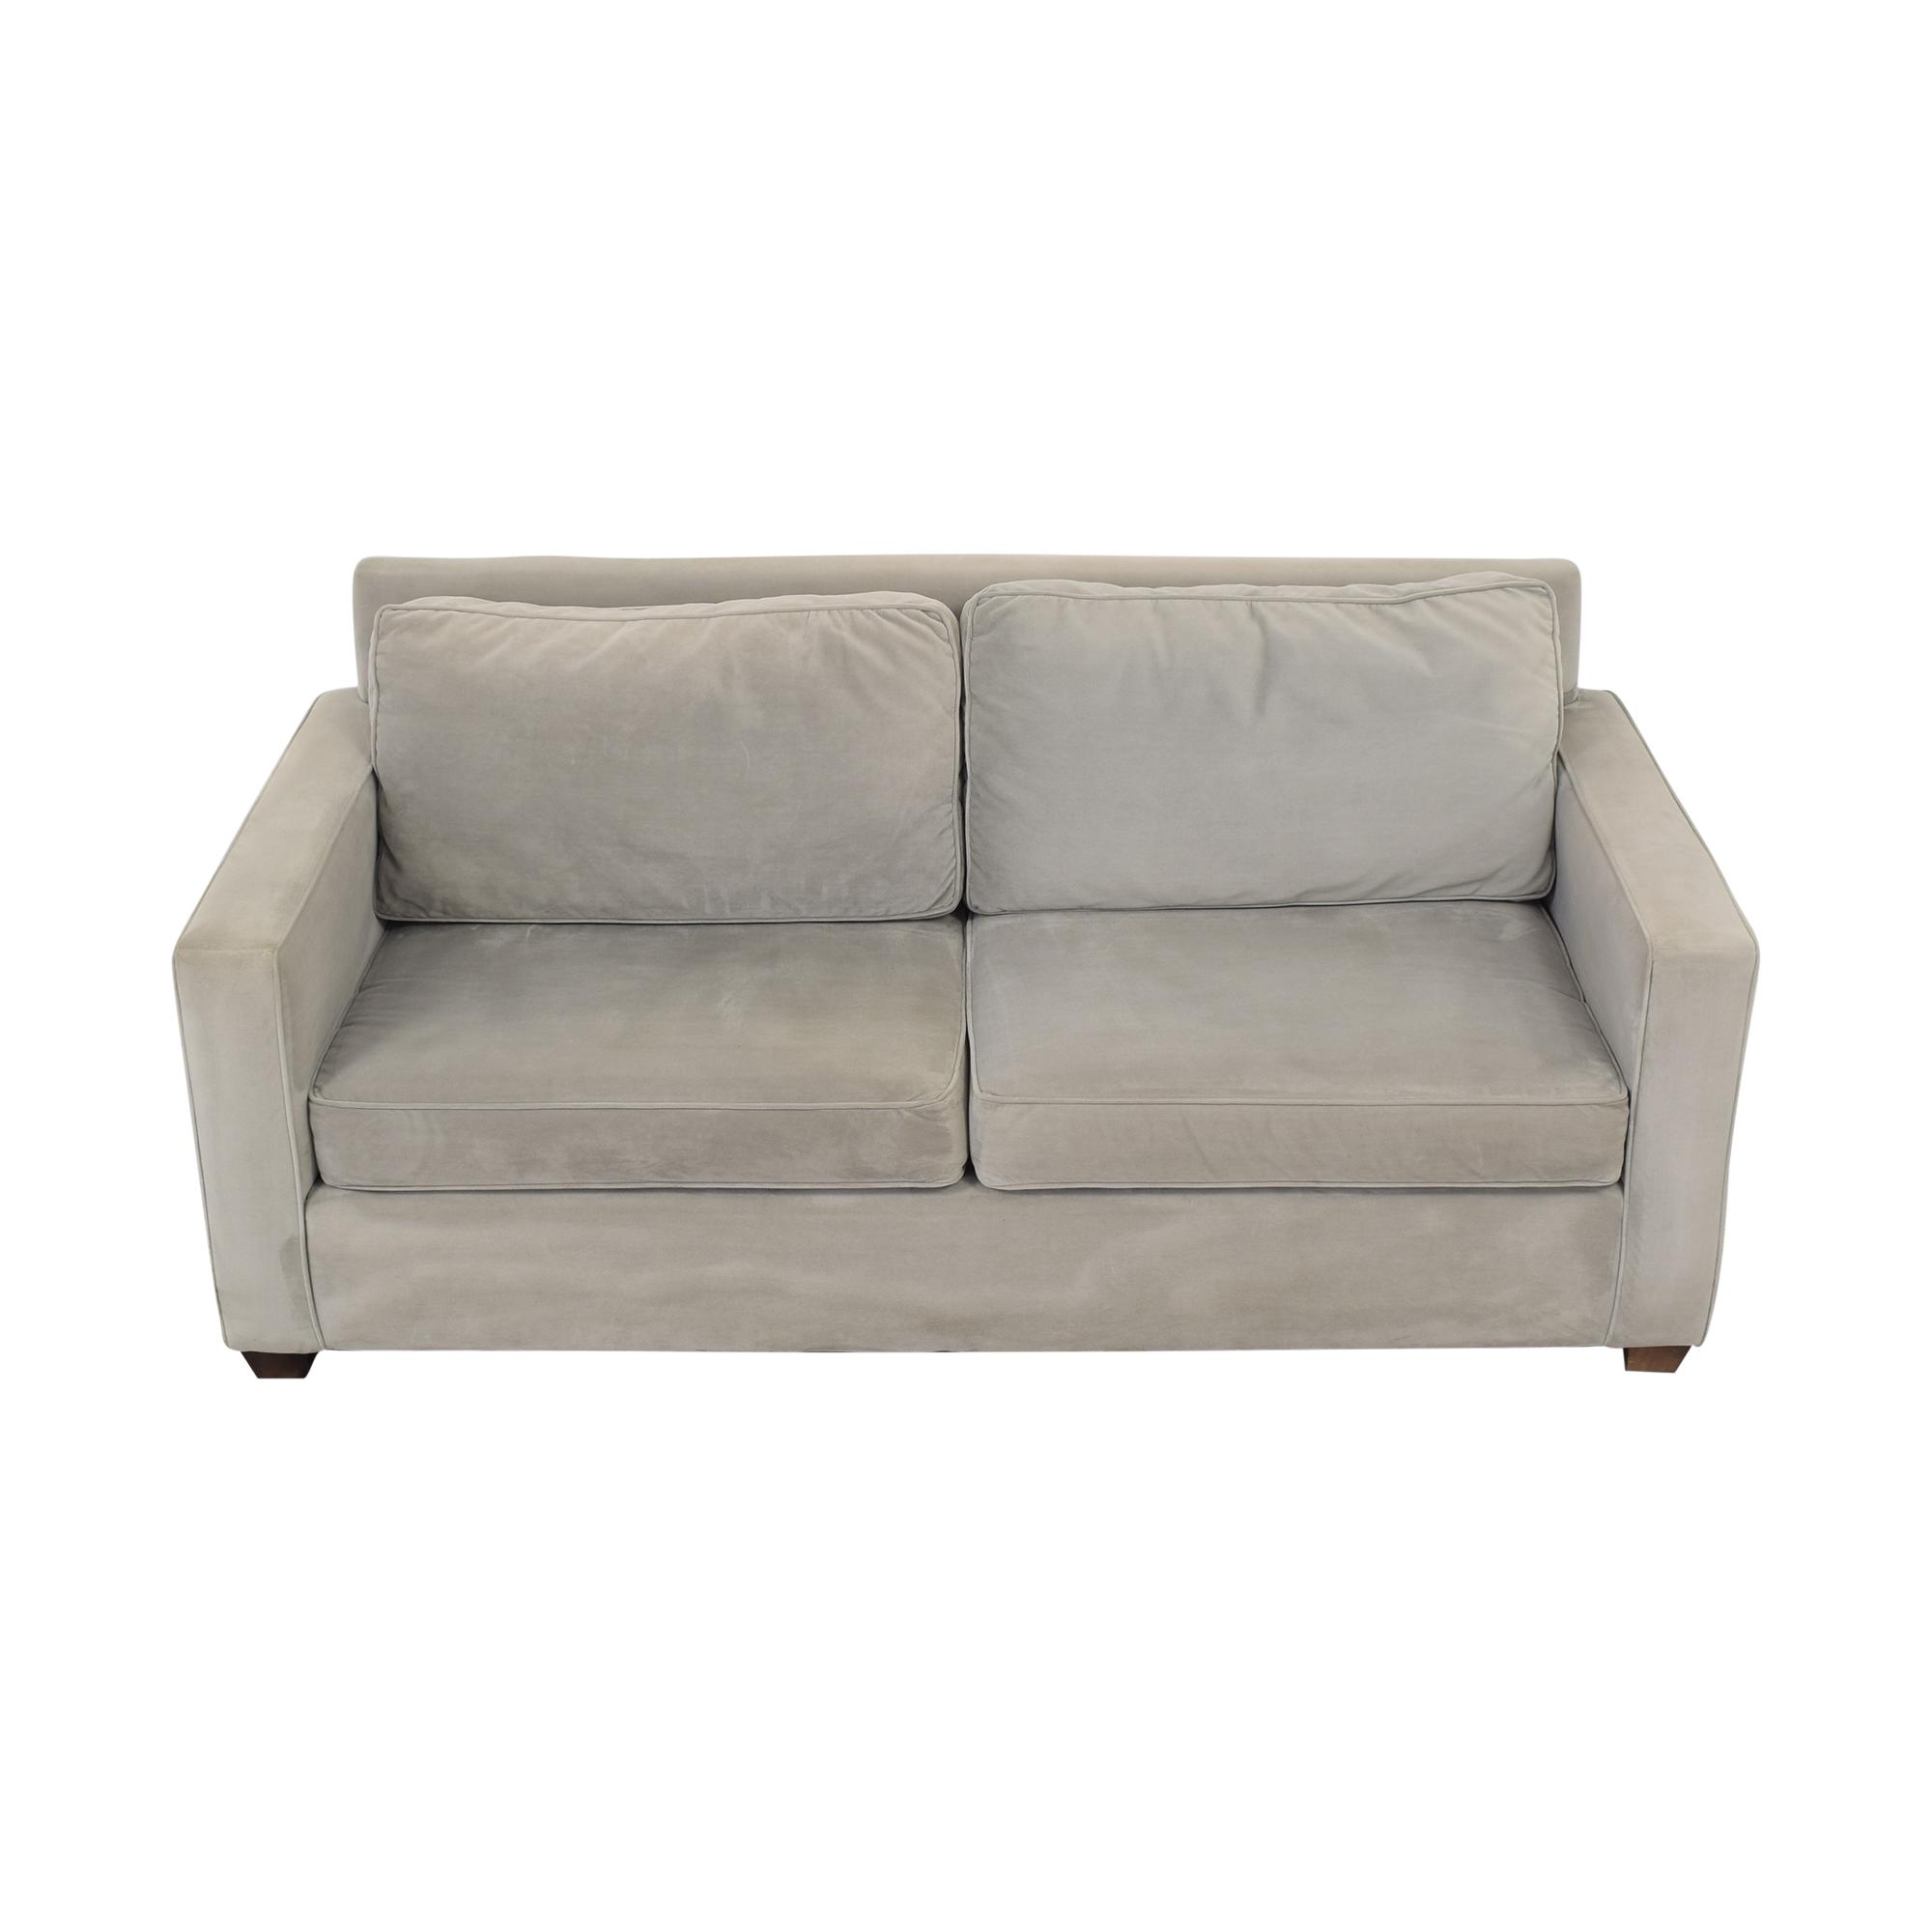 Williams Sonoma Williams Sonoma Two Cushion Sofa for sale